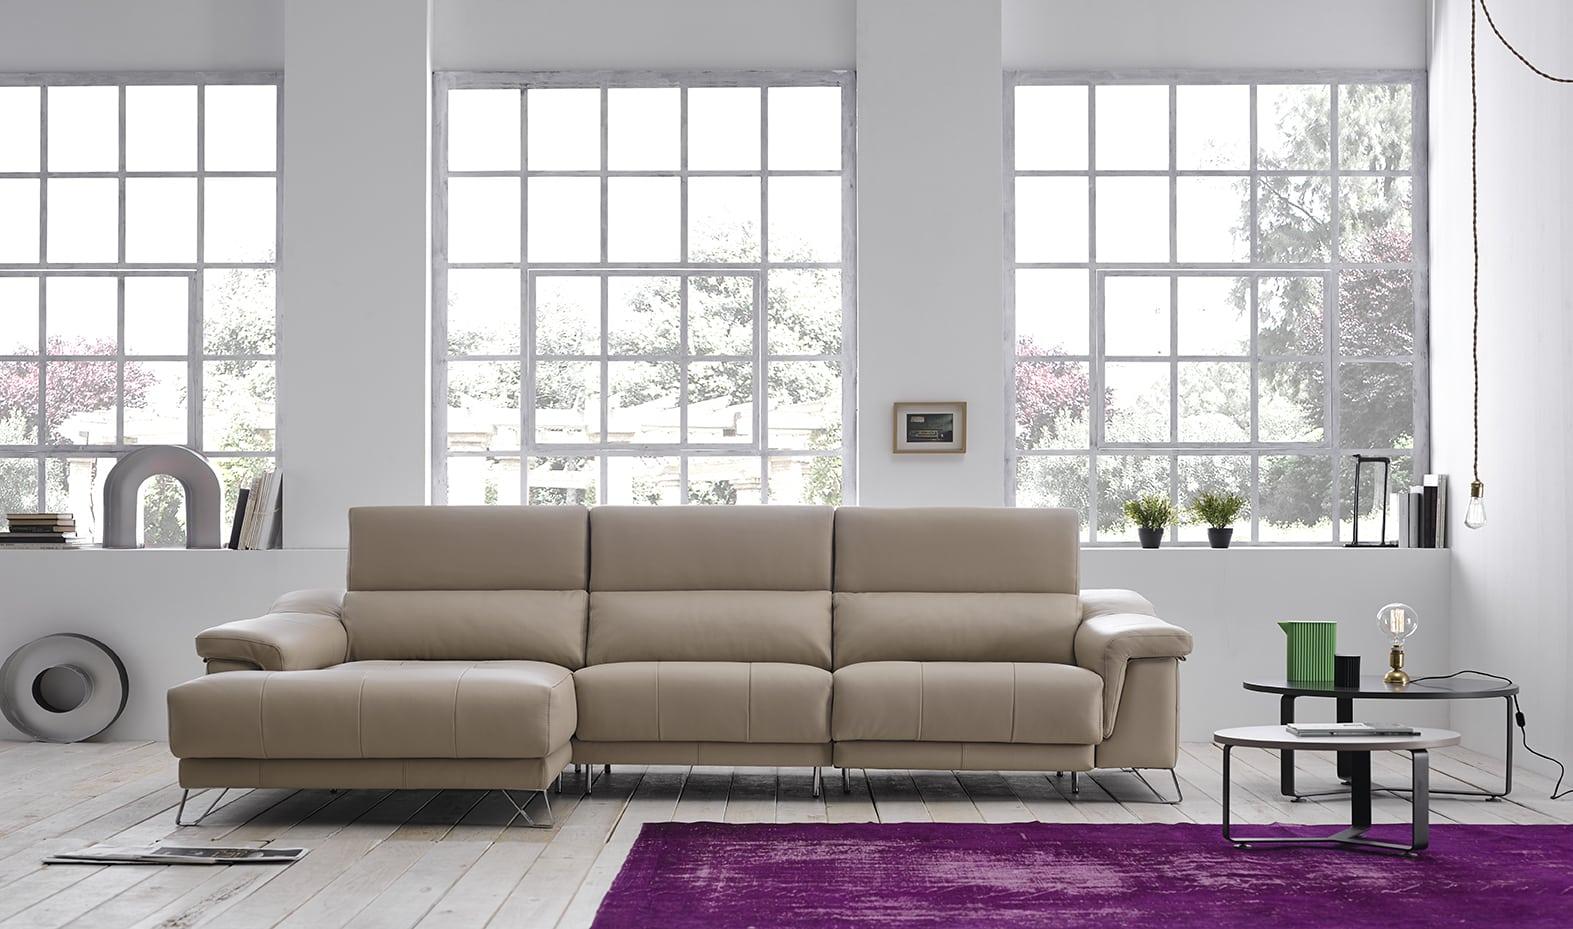 sofas-modernos-General-muebles-paco-caballero-1801-5cdfe89738d8d